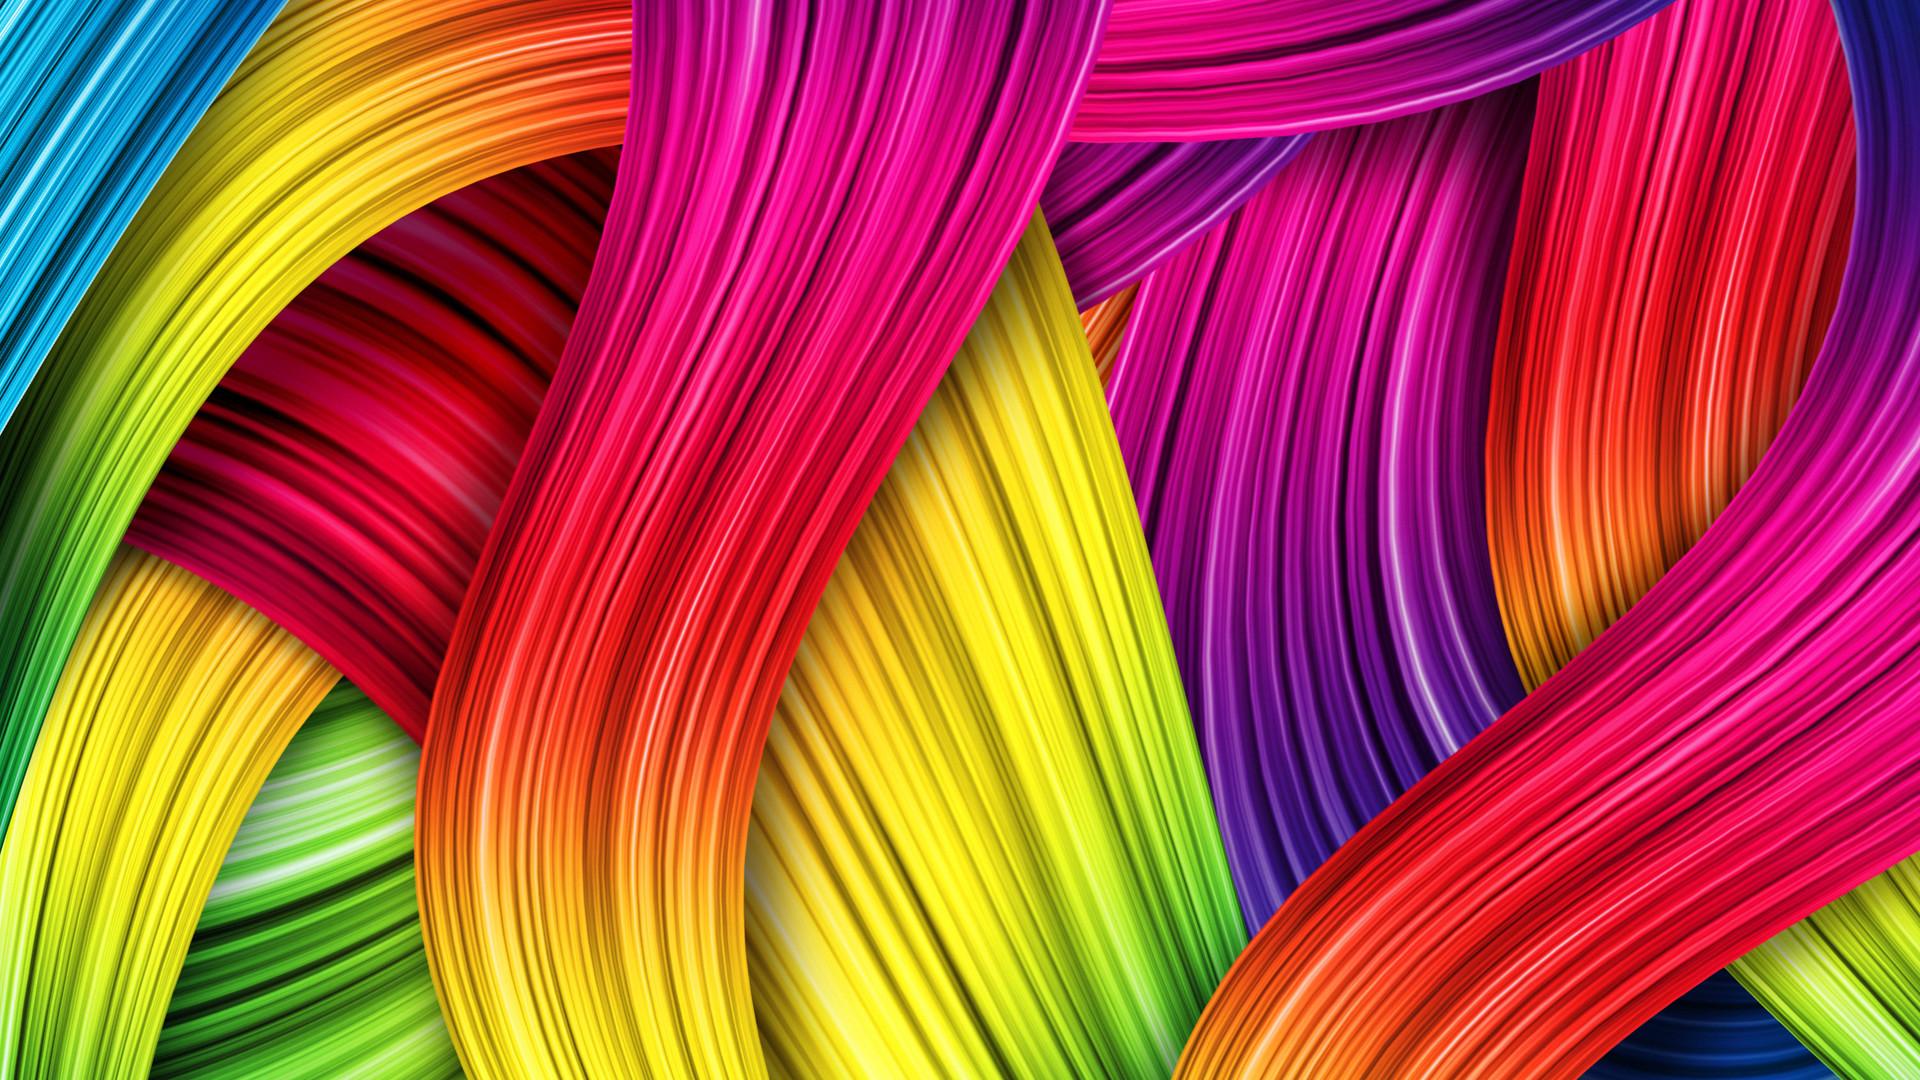 Colorful HD Wallpaper